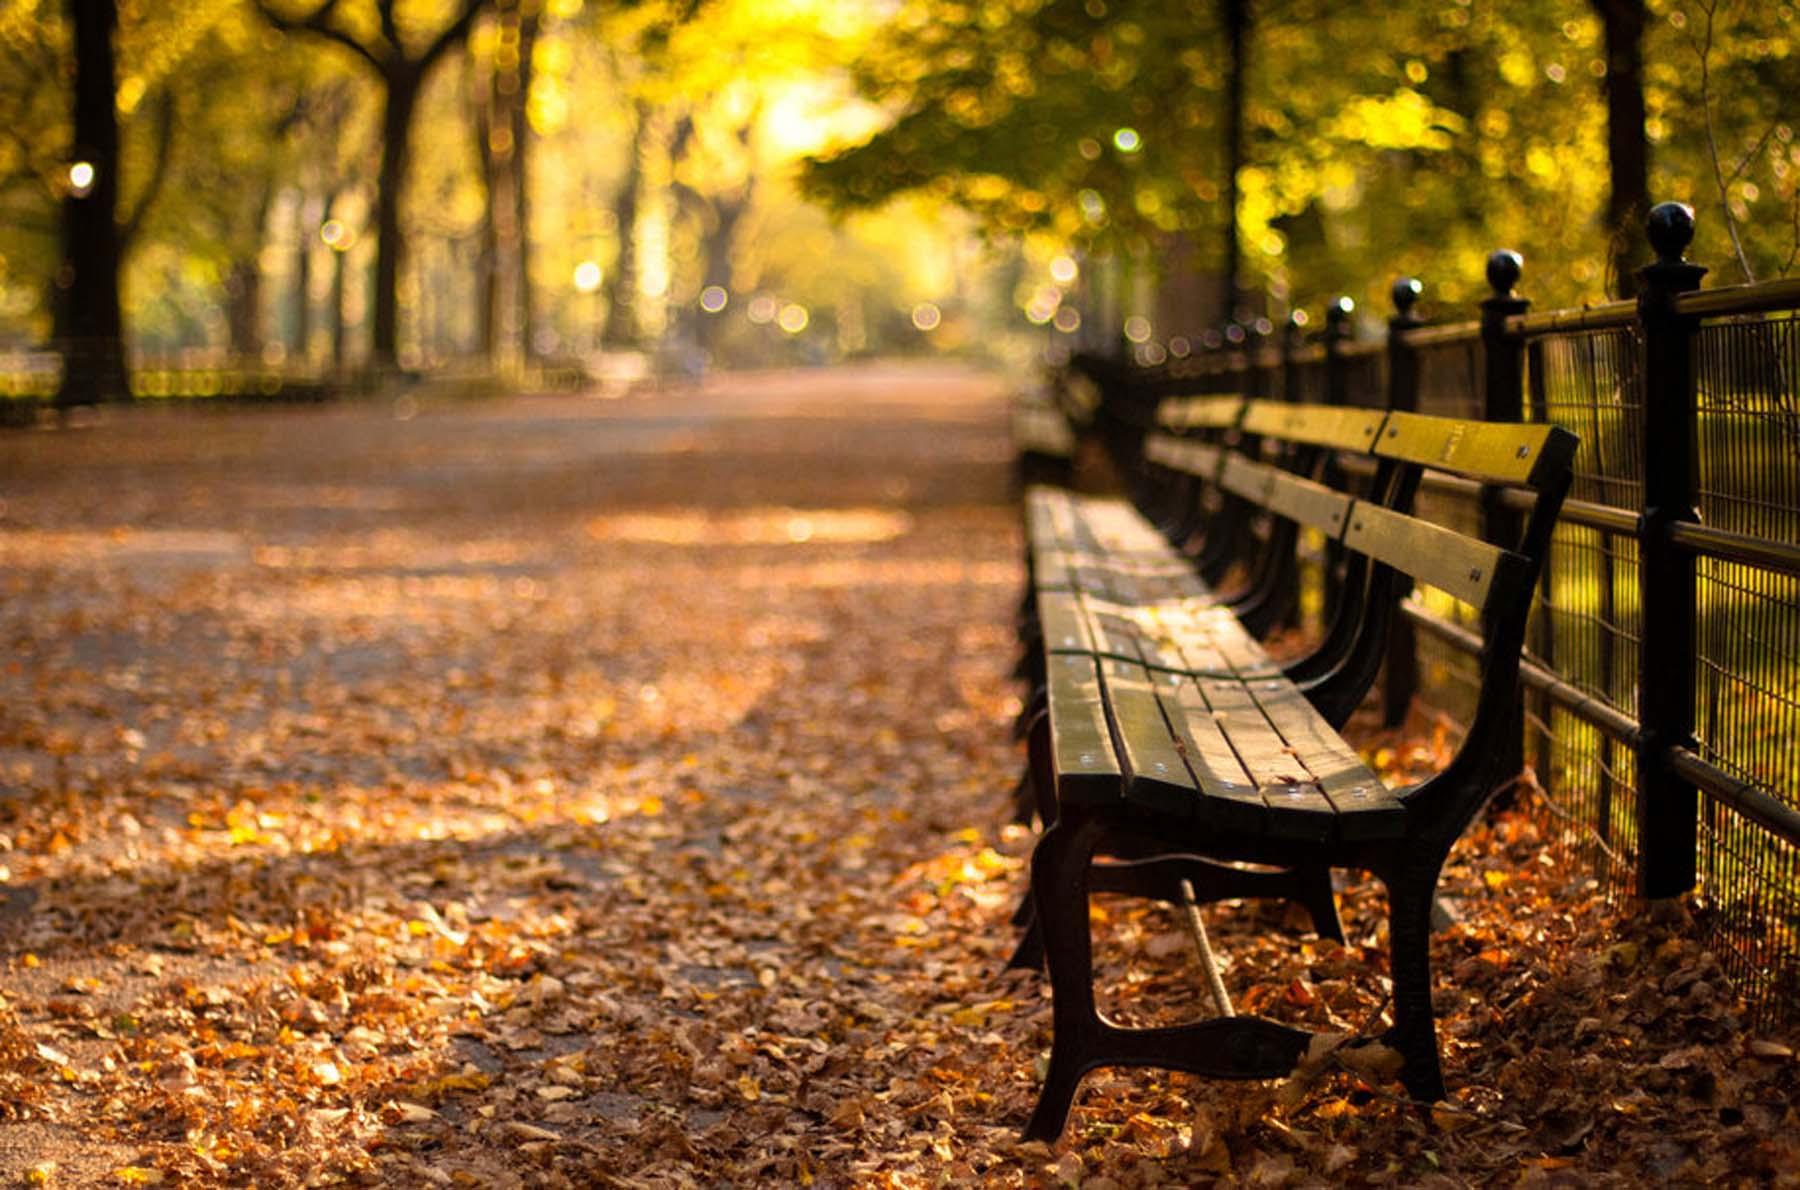 143610__central-park-new-york-autumn-sunset-new-york-sunset-park_p